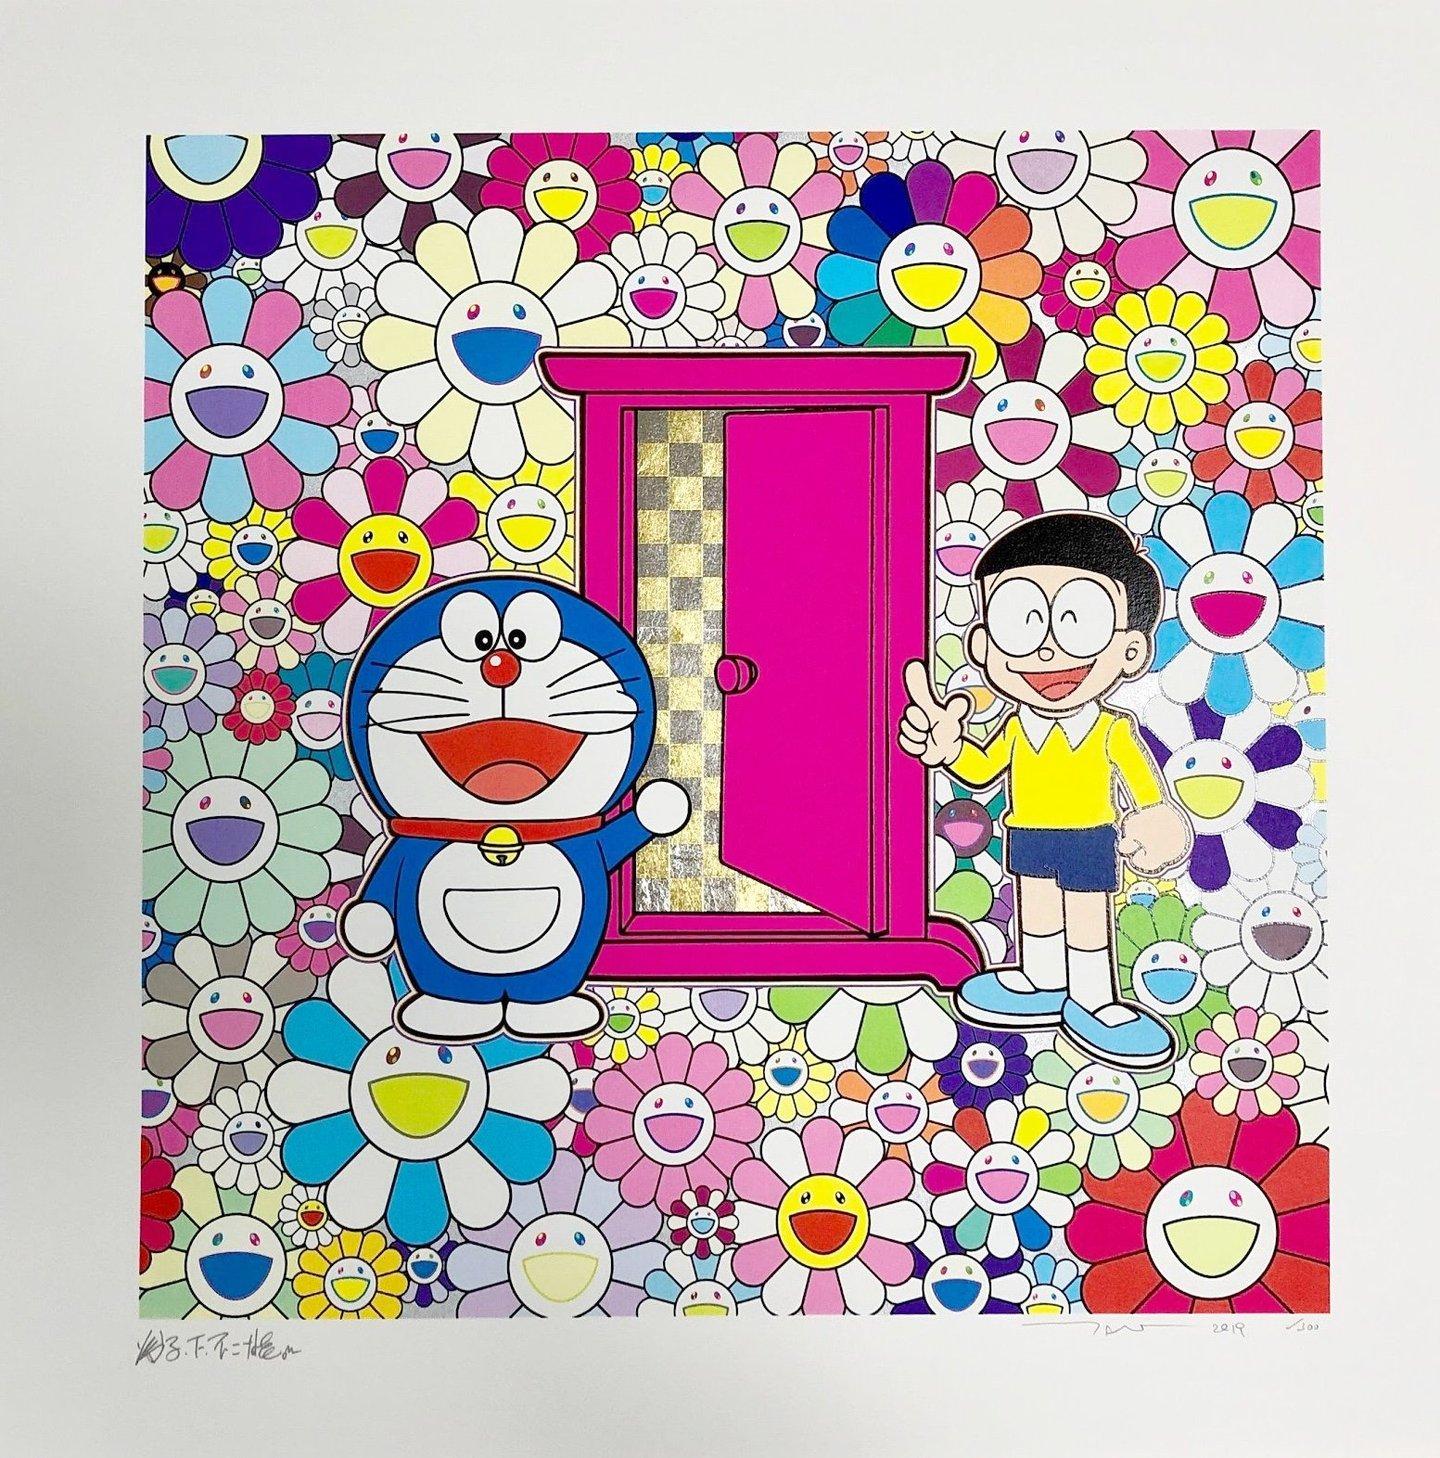 Anywhere Door In The Field Of Flowers by Takashi Murakami